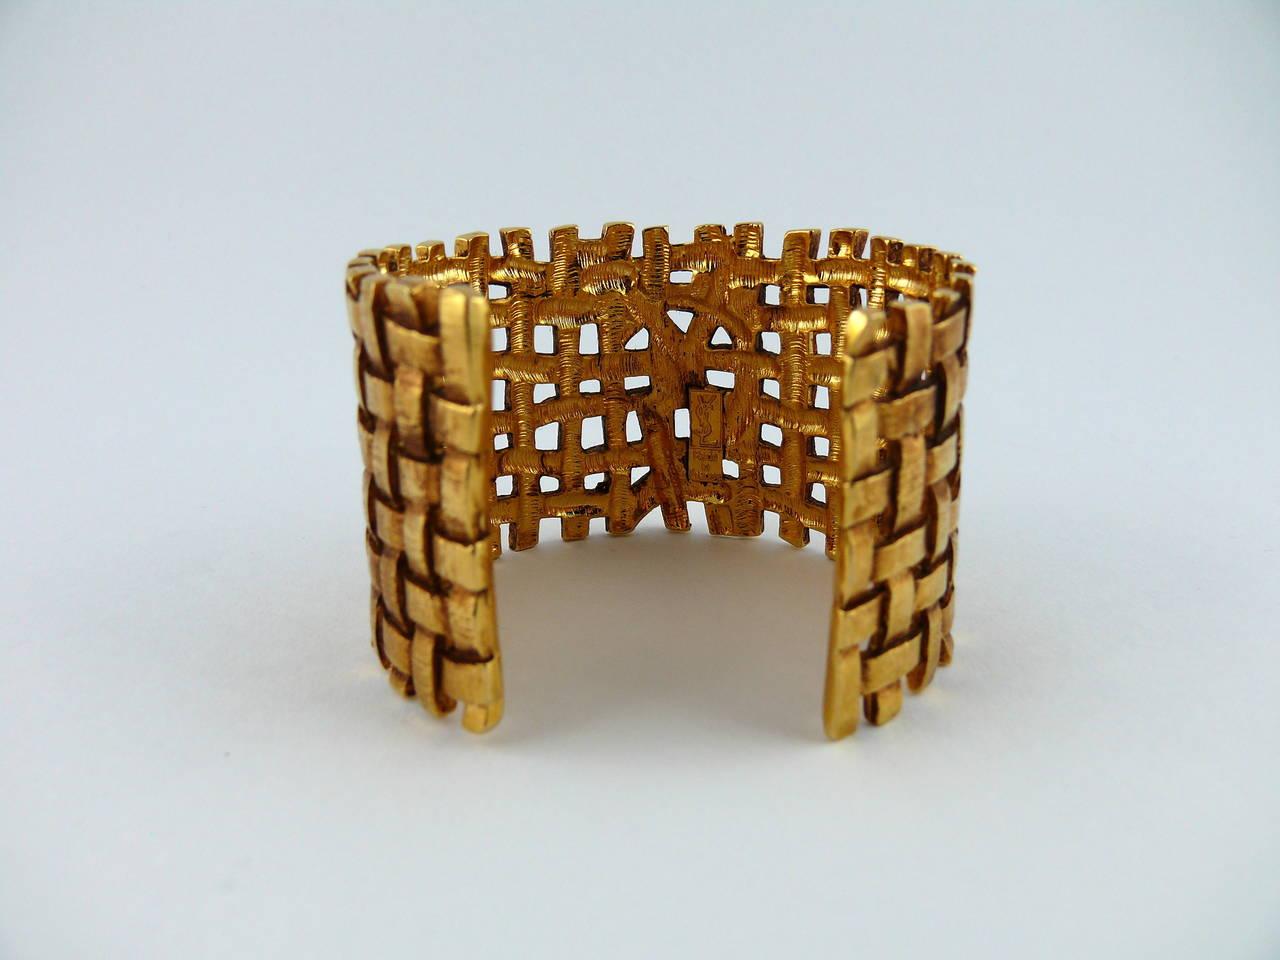 Yves Saint Laurent YSL Vintage Gold Toned Woven Cuff Bracelet For Sale 2